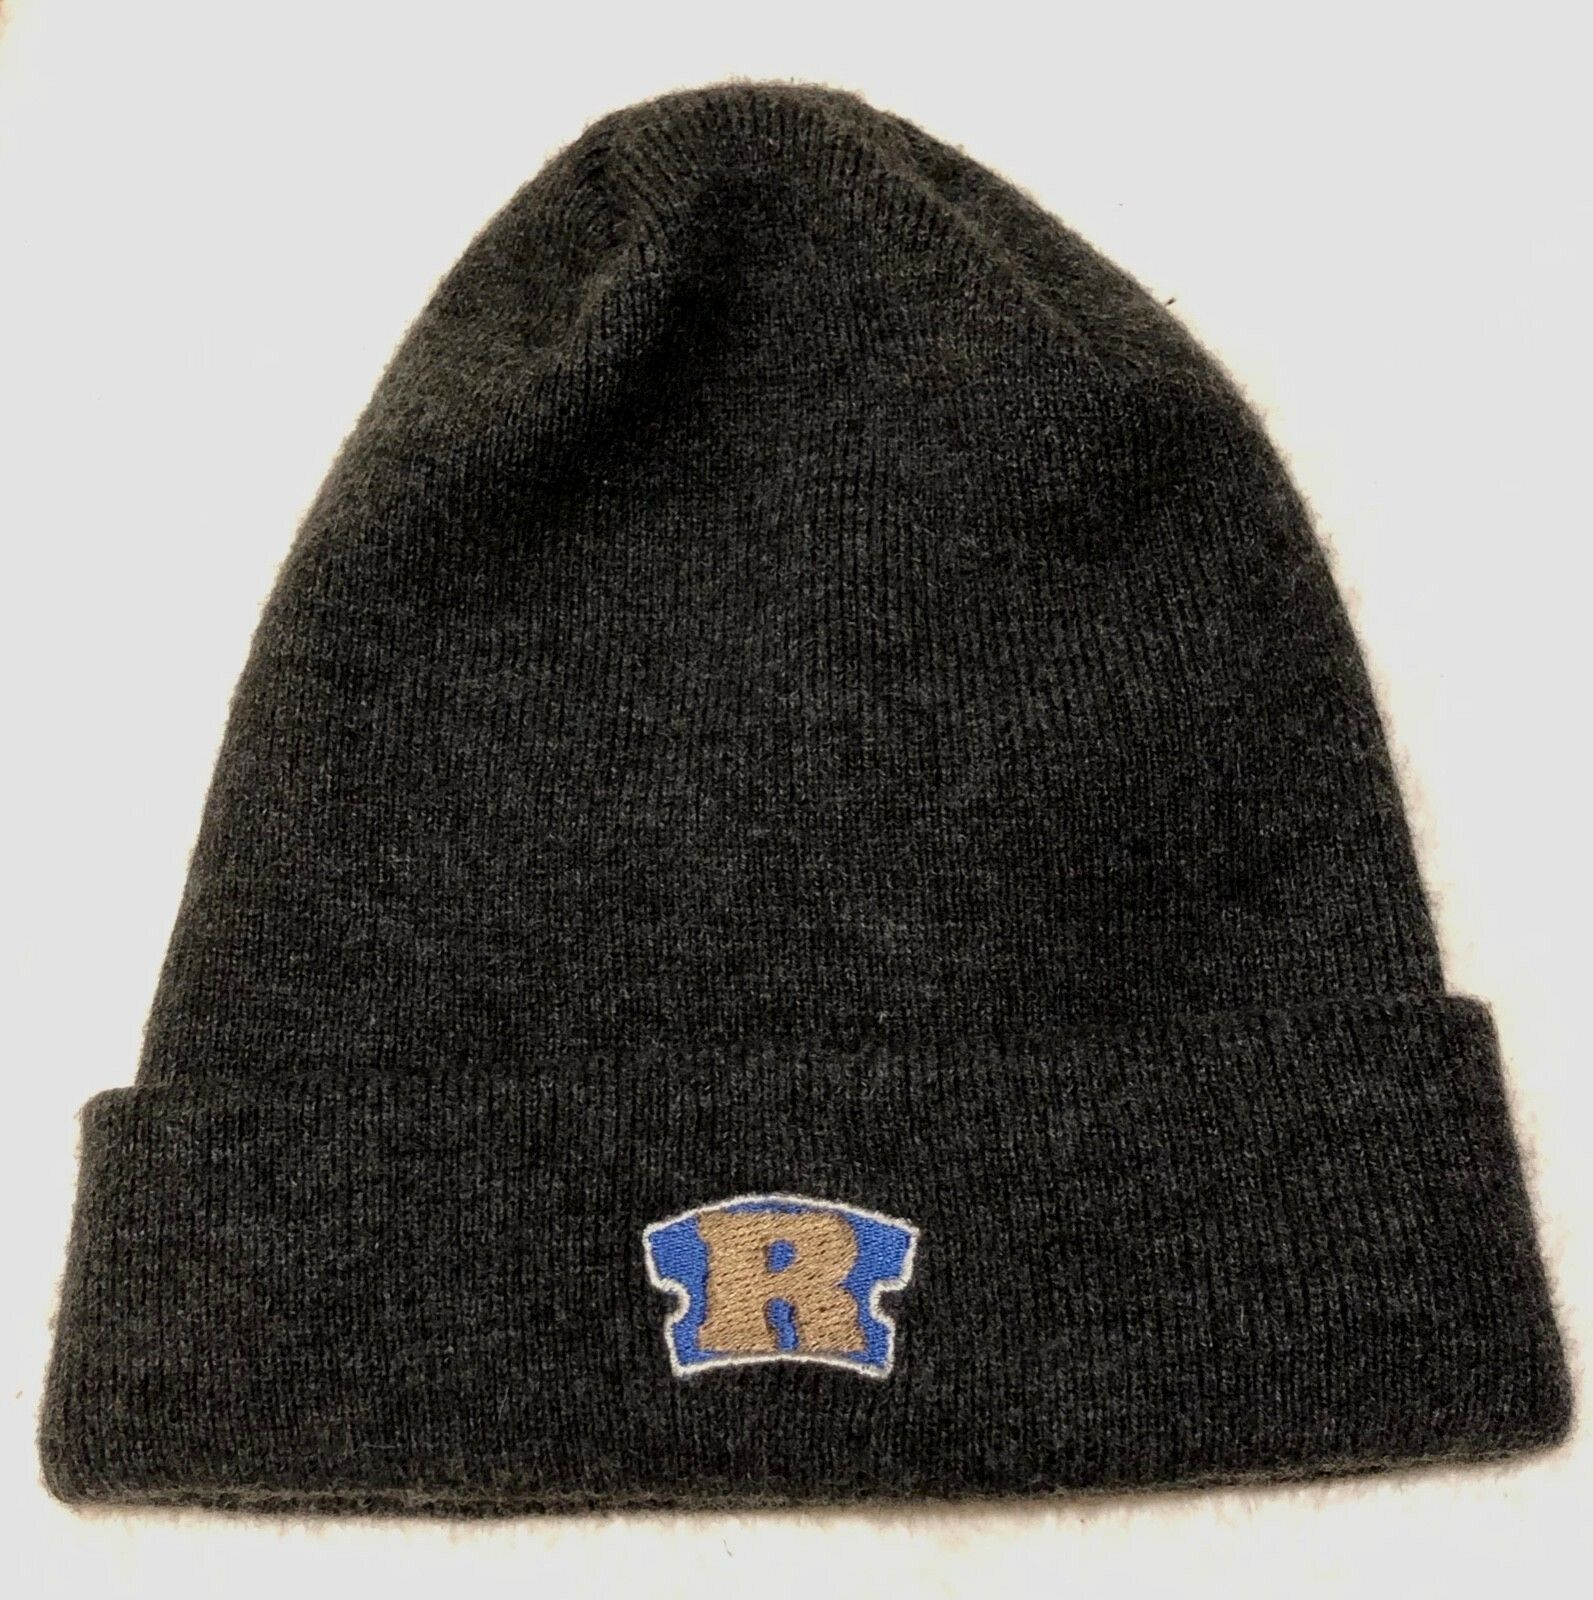 1999 RAWKUS RECORDS razor blade logo promo beanie hat cap vtg 90s rap shirt